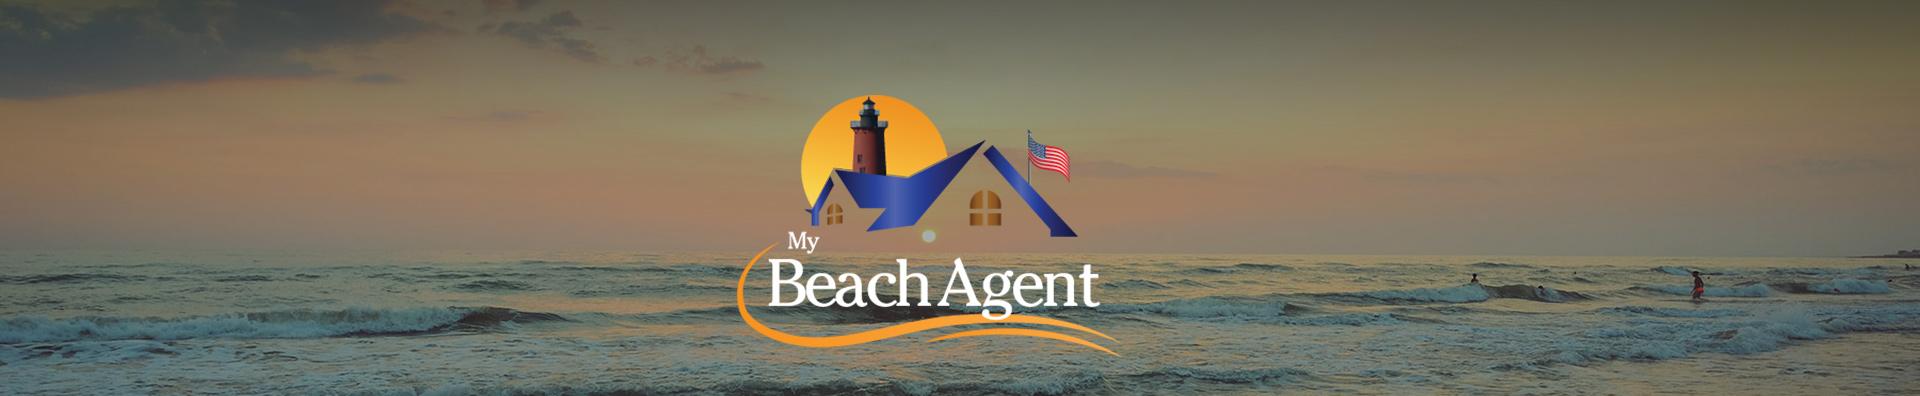 My Beach Agent